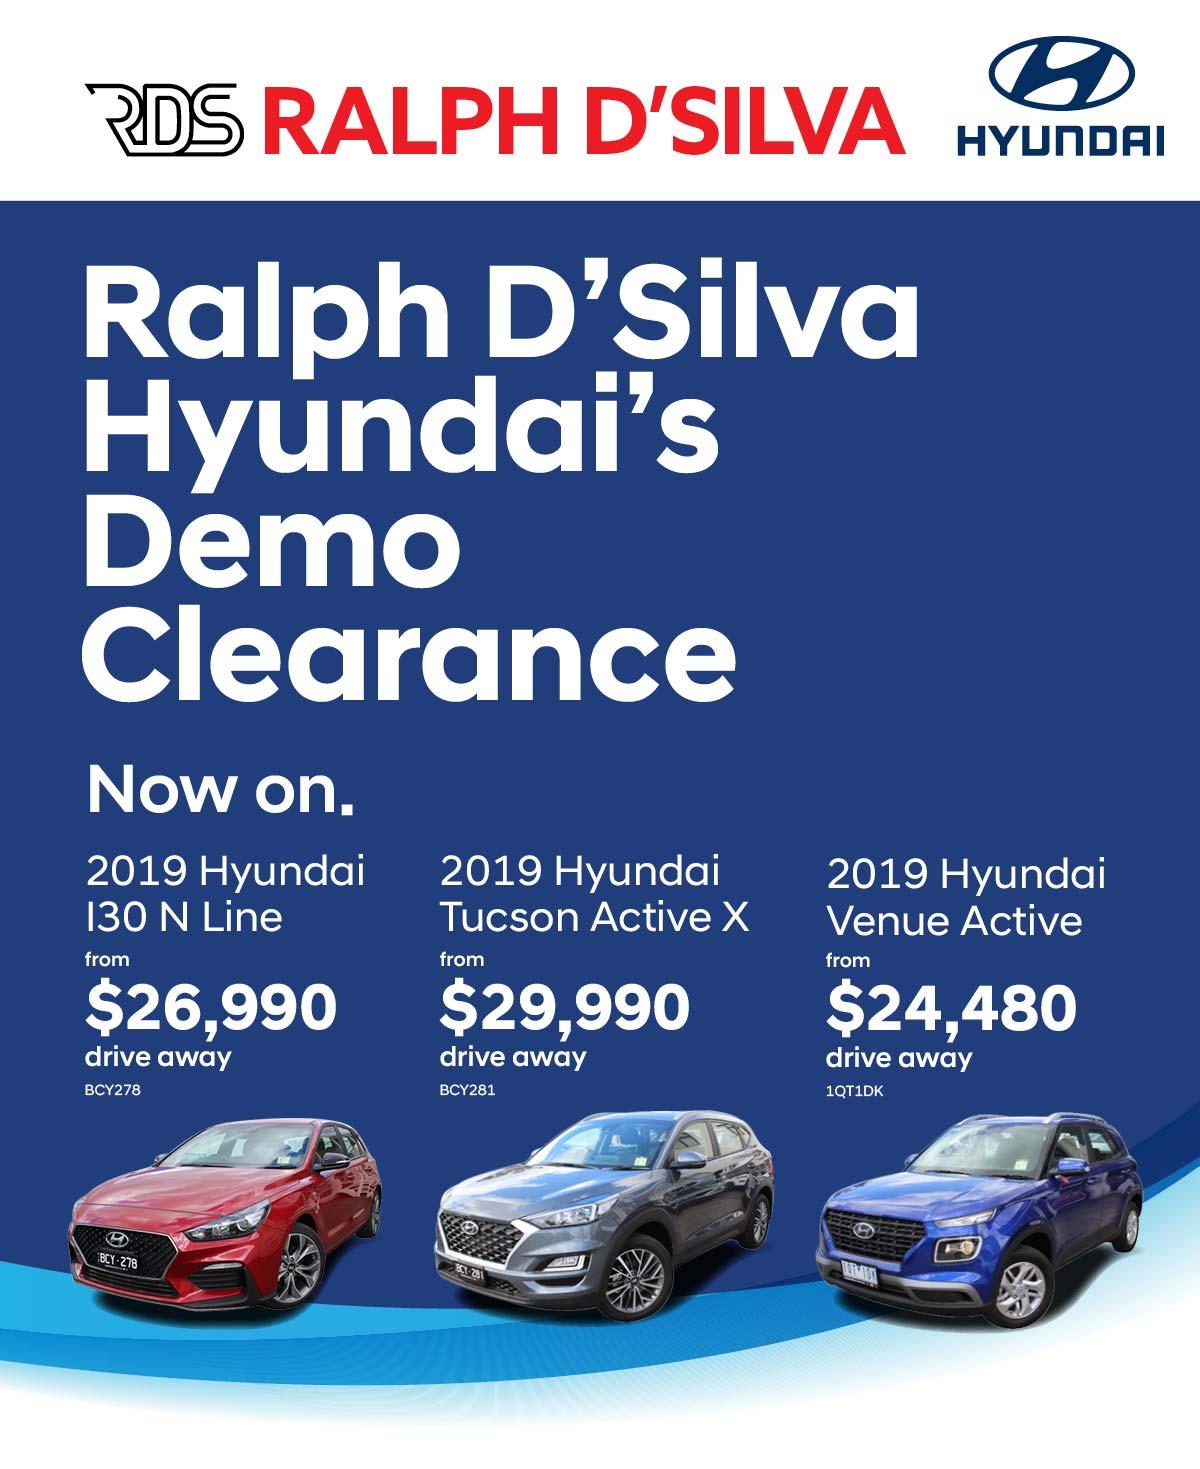 Hyundai Demo Clearance